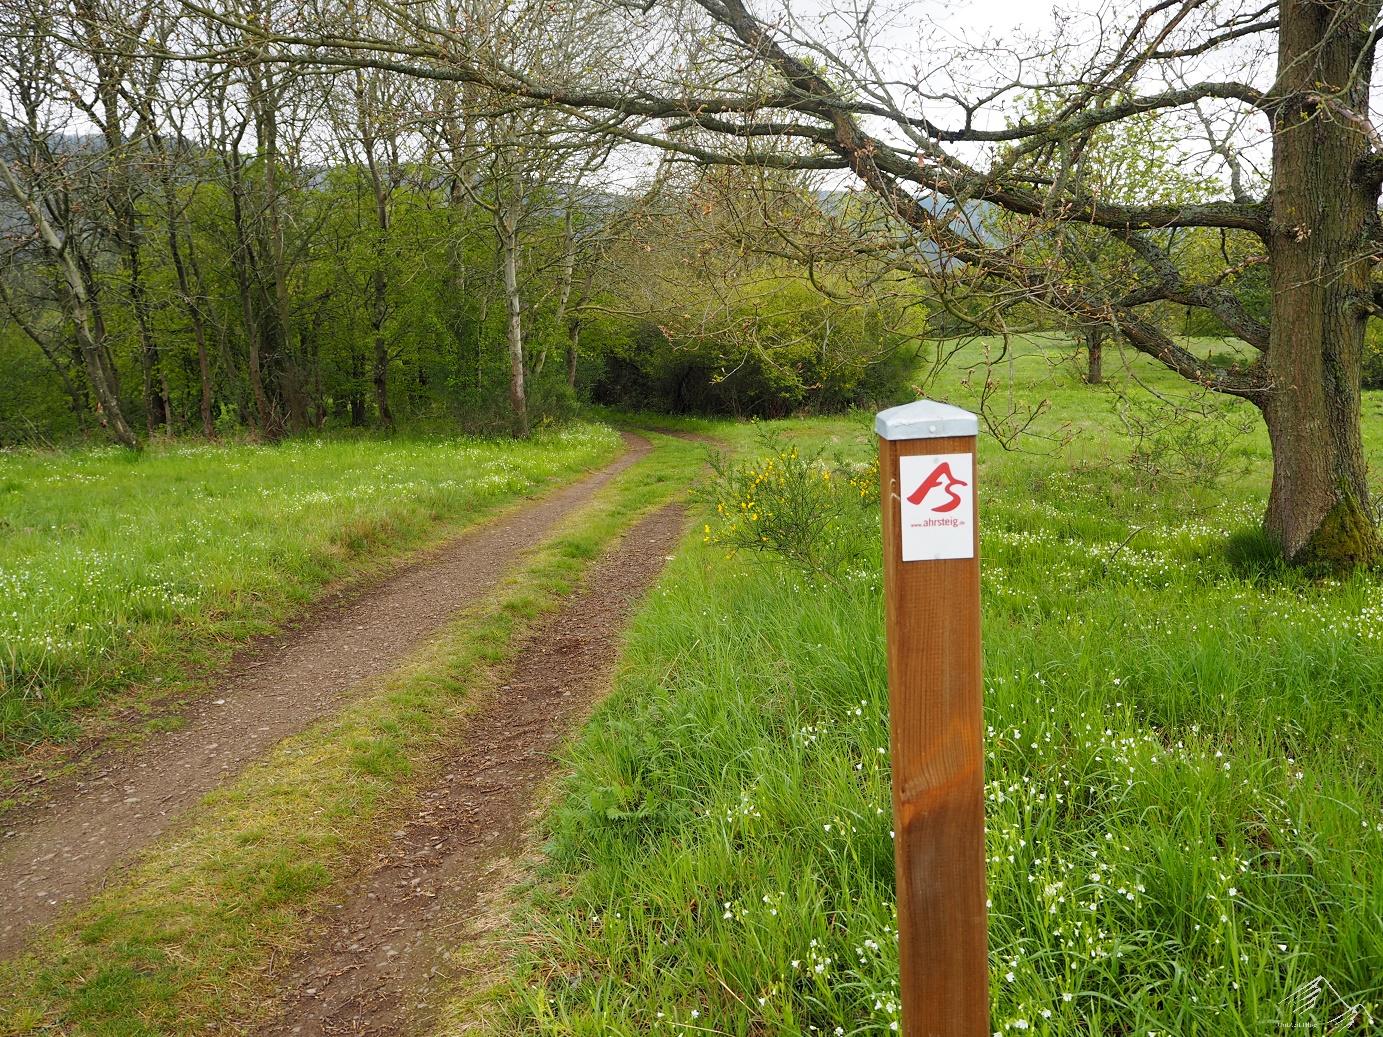 Ahrsteig Etappe 5 - Wandersymbol